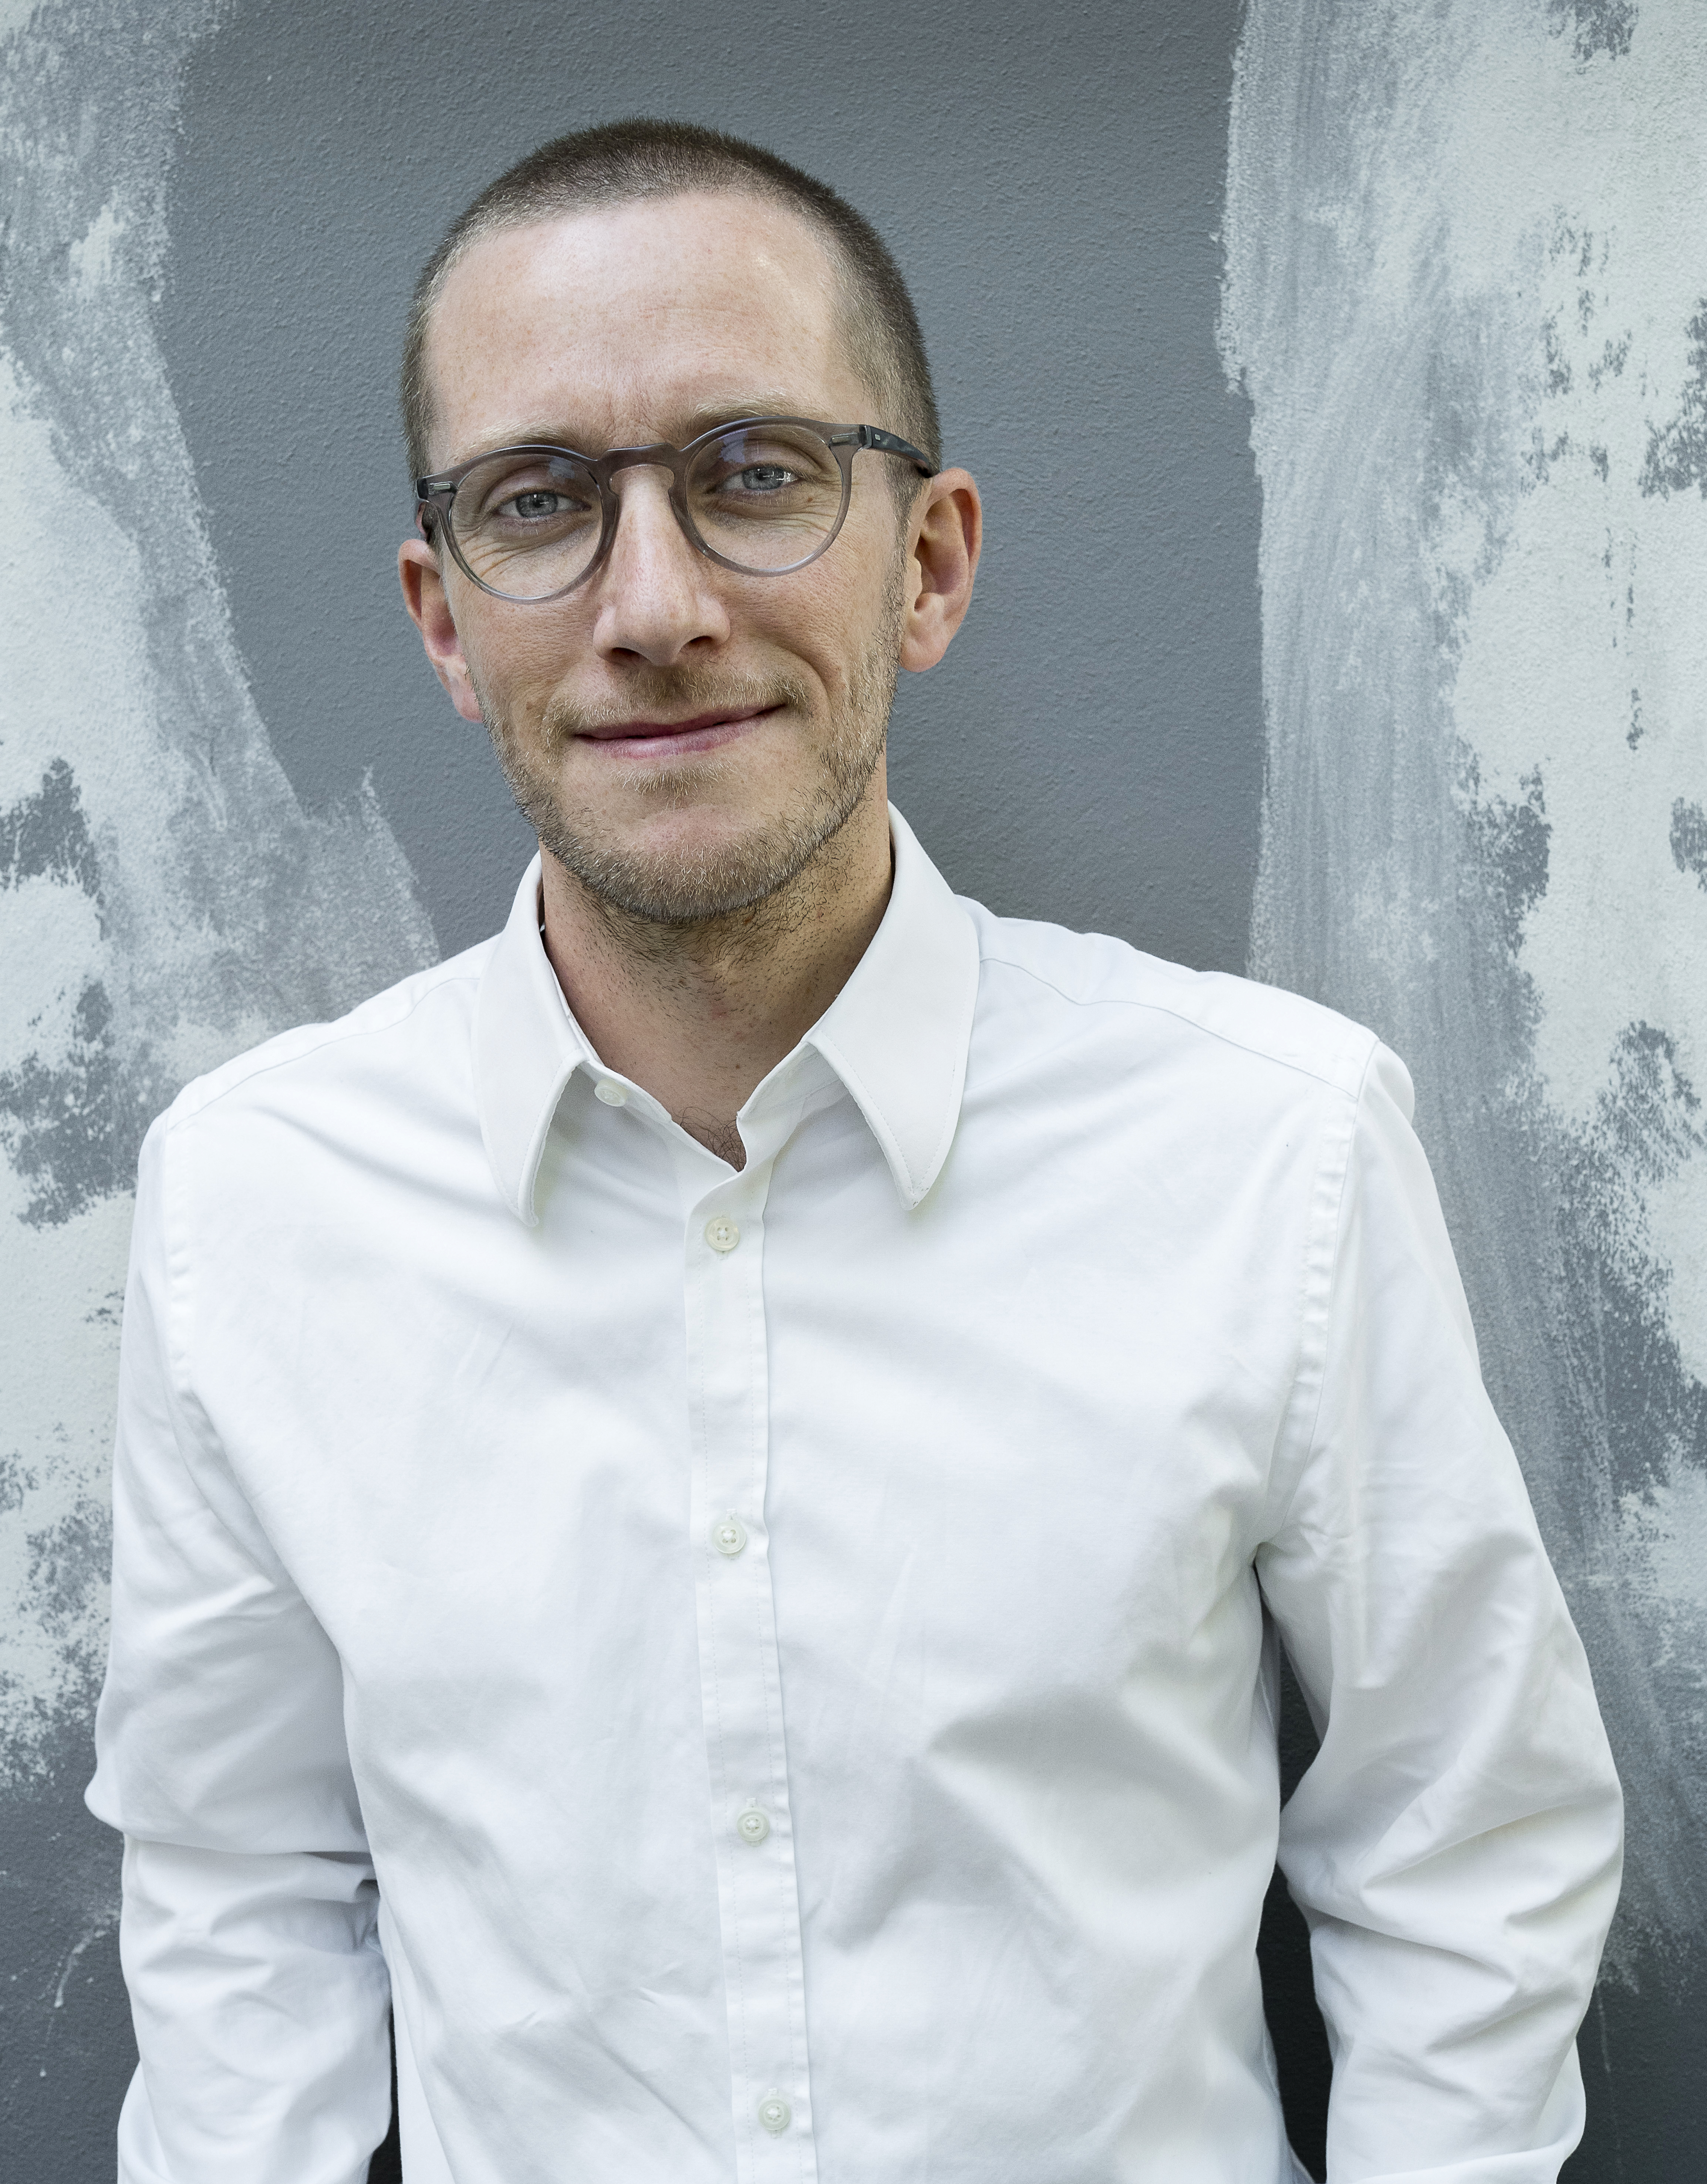 Lars Petter Sveen